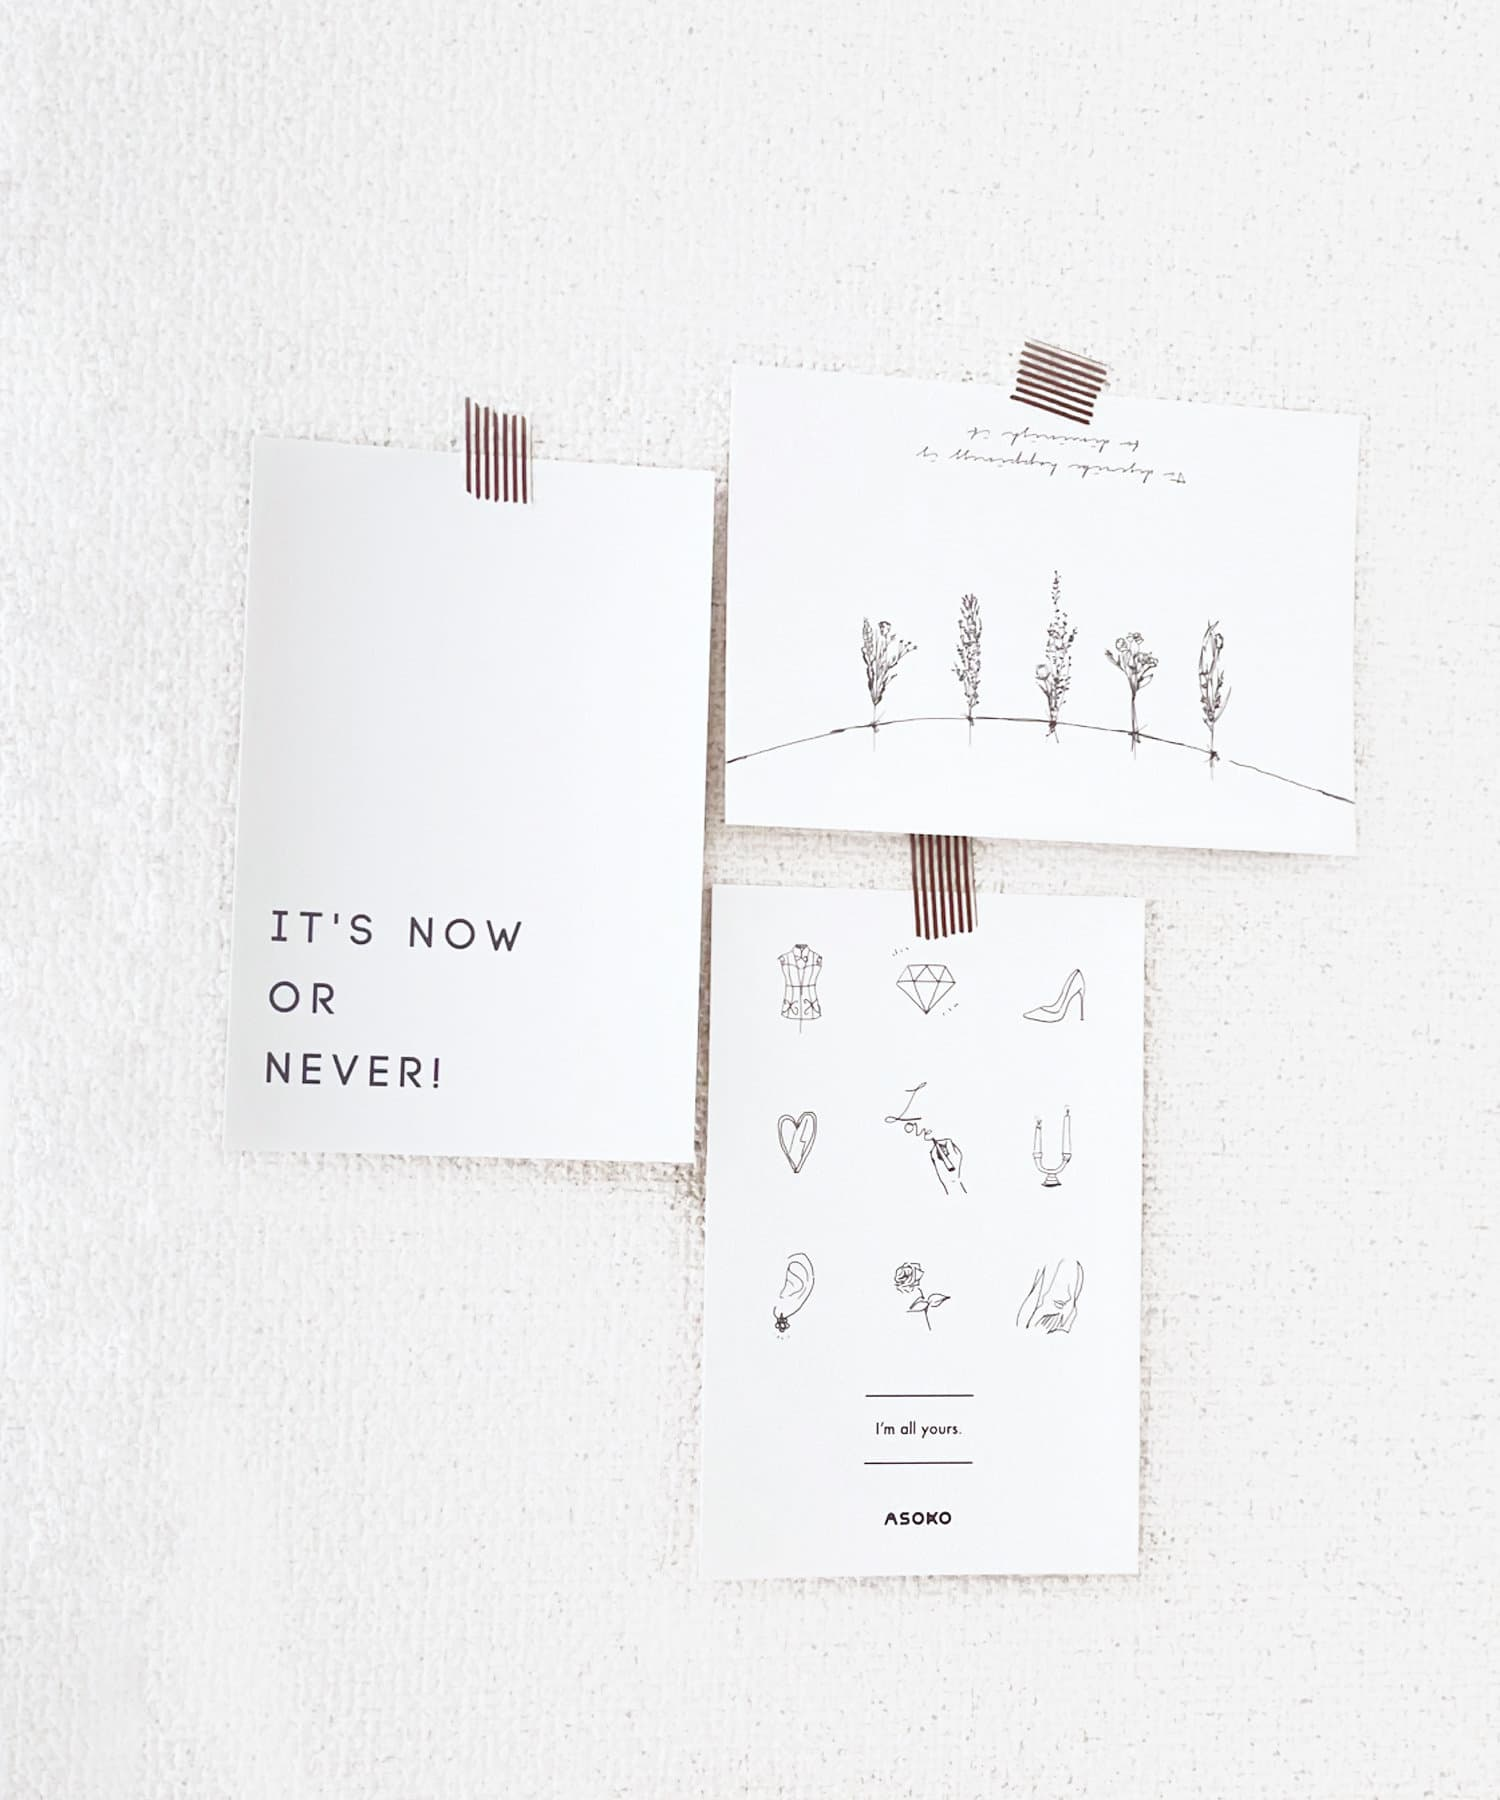 ASOKO(アソコ) ライフスタイル 【fem fem fem】ポストカード3枚セット ブラック